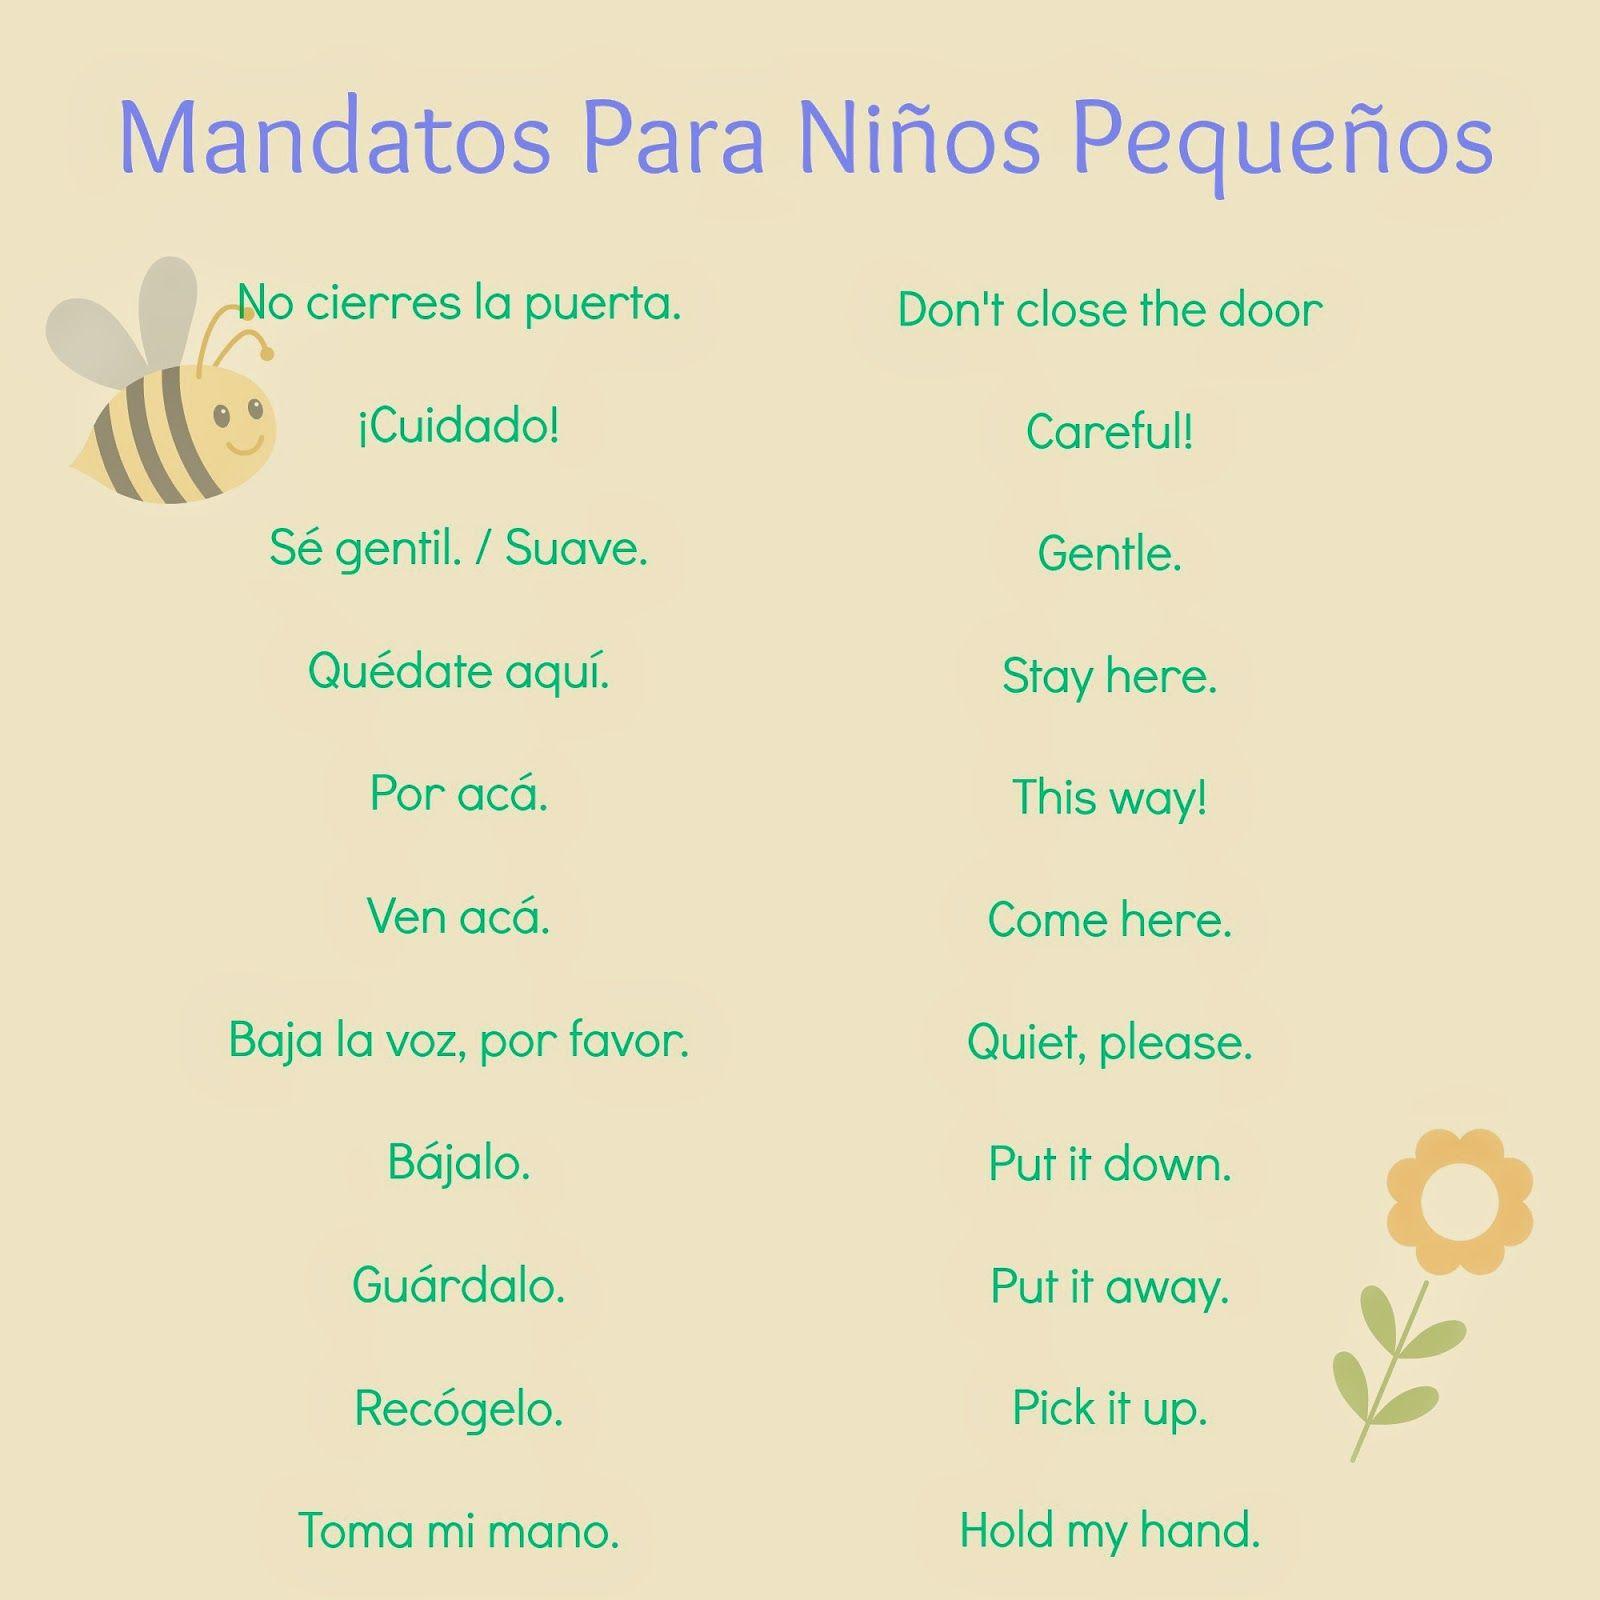 Mandatos Para Ninos Pequenos Commands In Spanish For